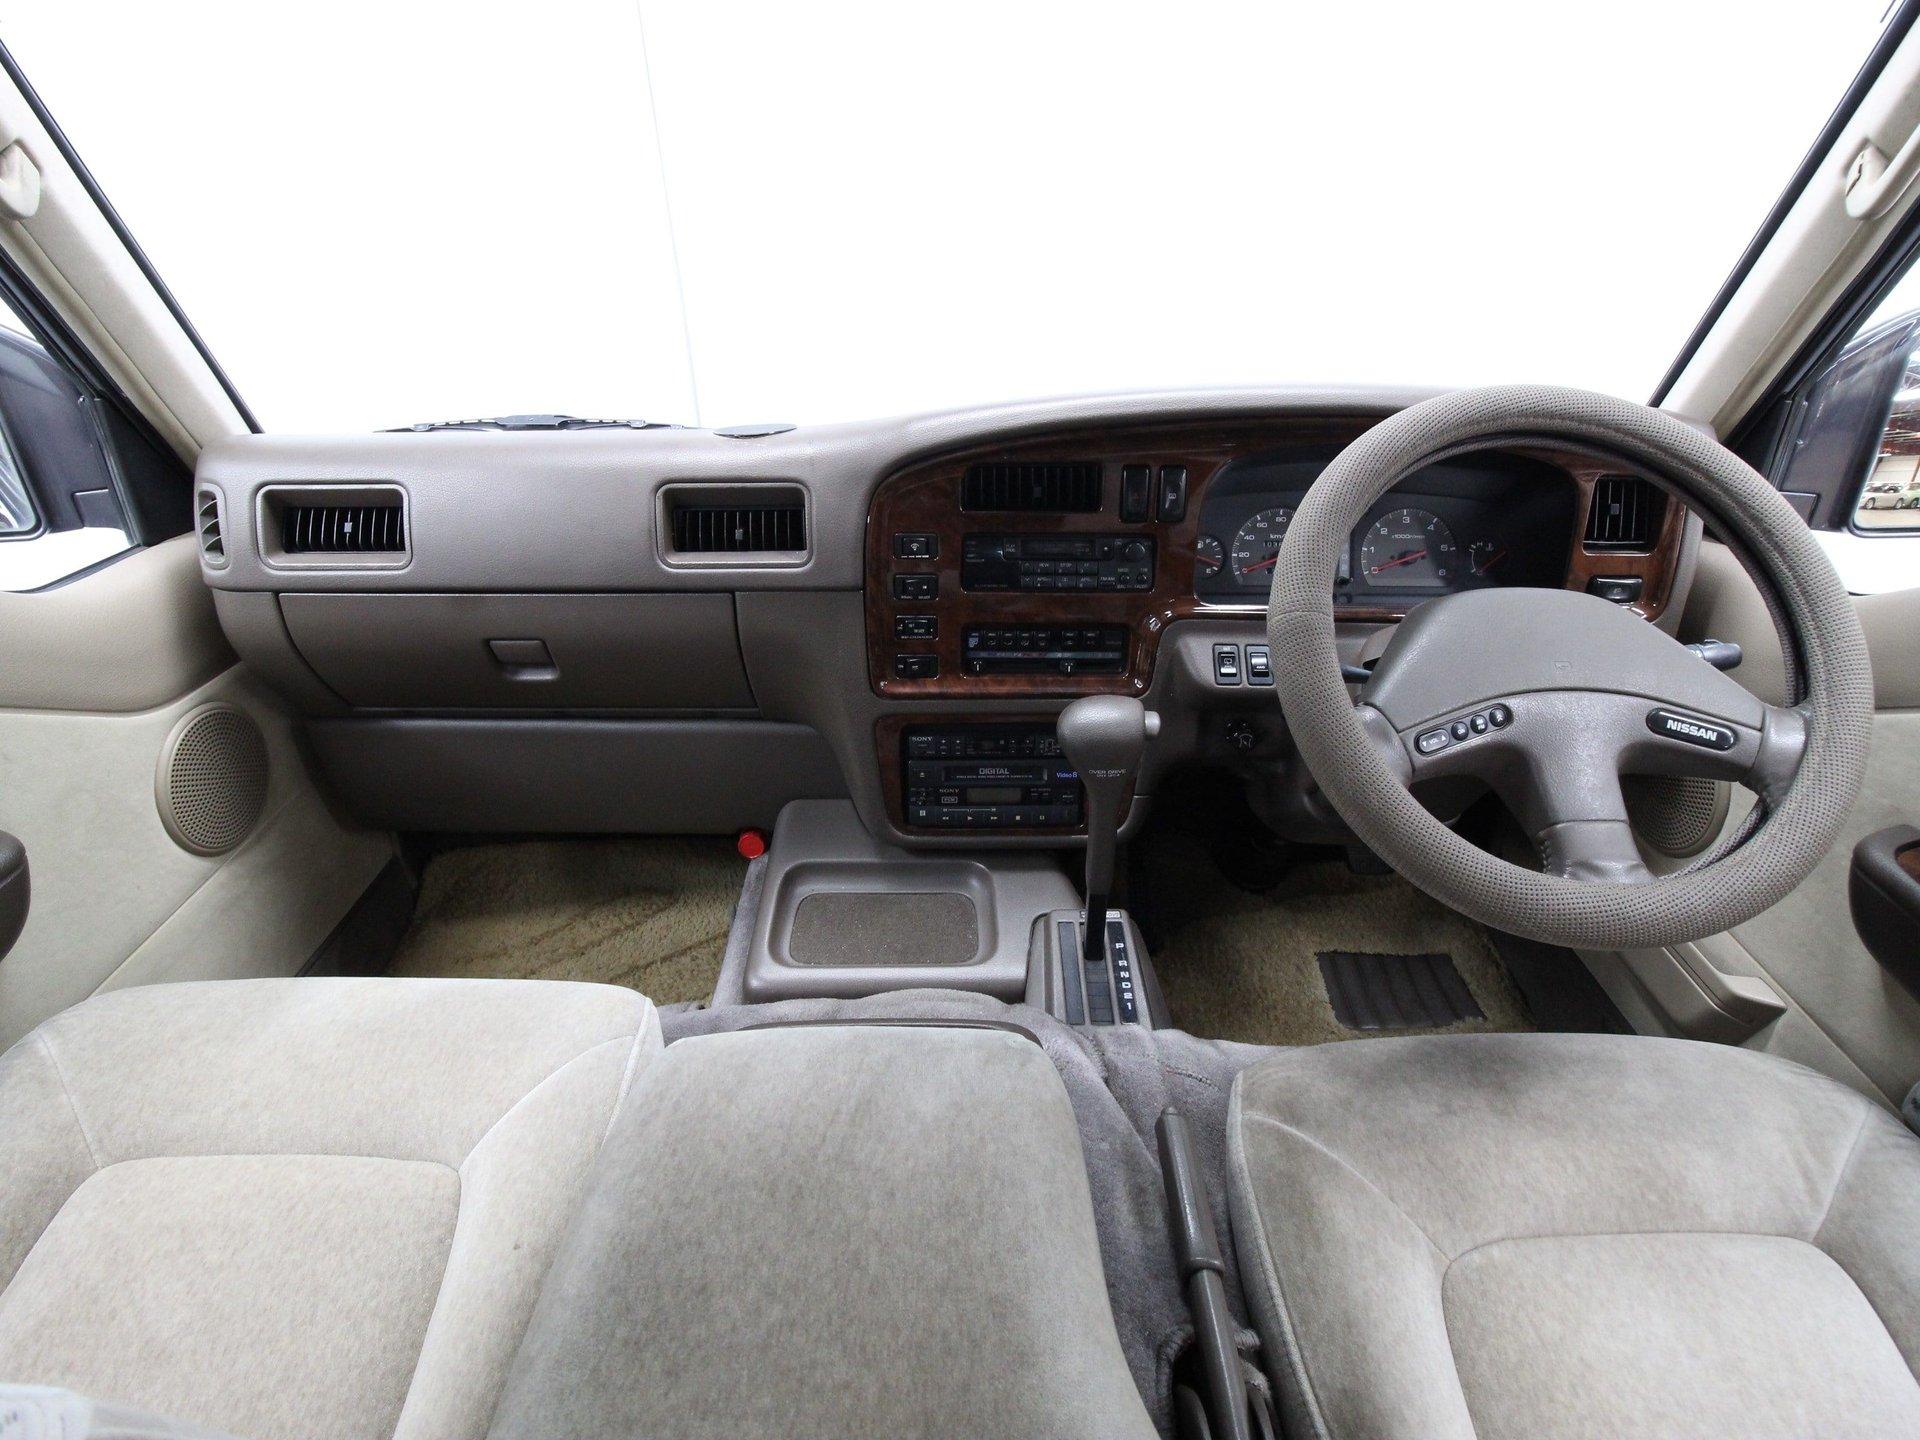 1992 Nissan Homy